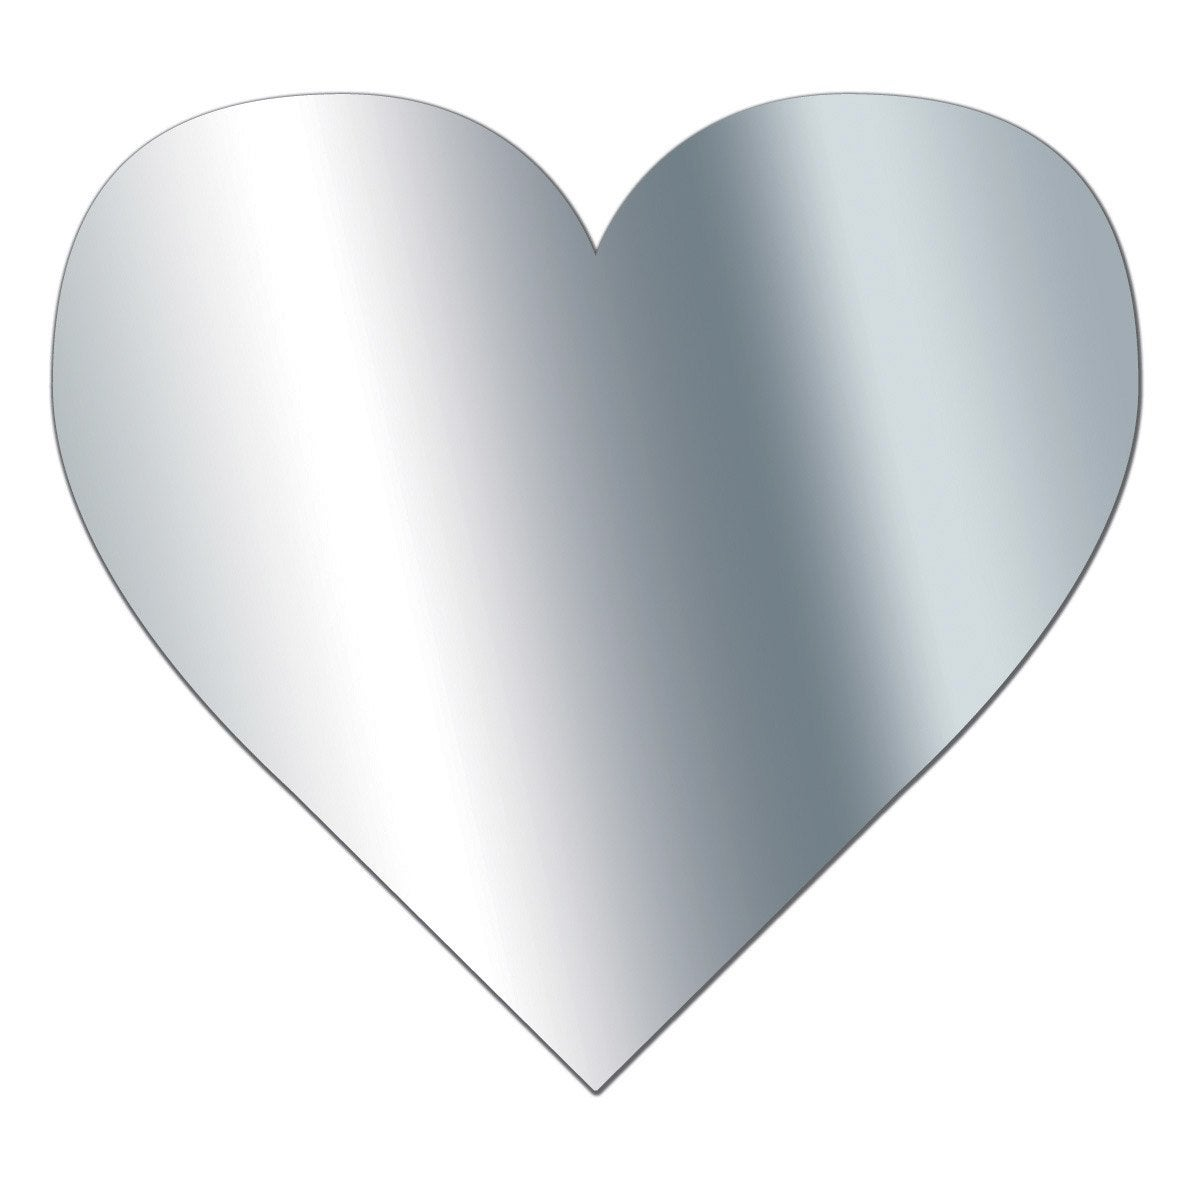 Miroir en plexiglass coeur 10 cm x 10 cm leroy merlin for Grand miroir mural leroy merlin